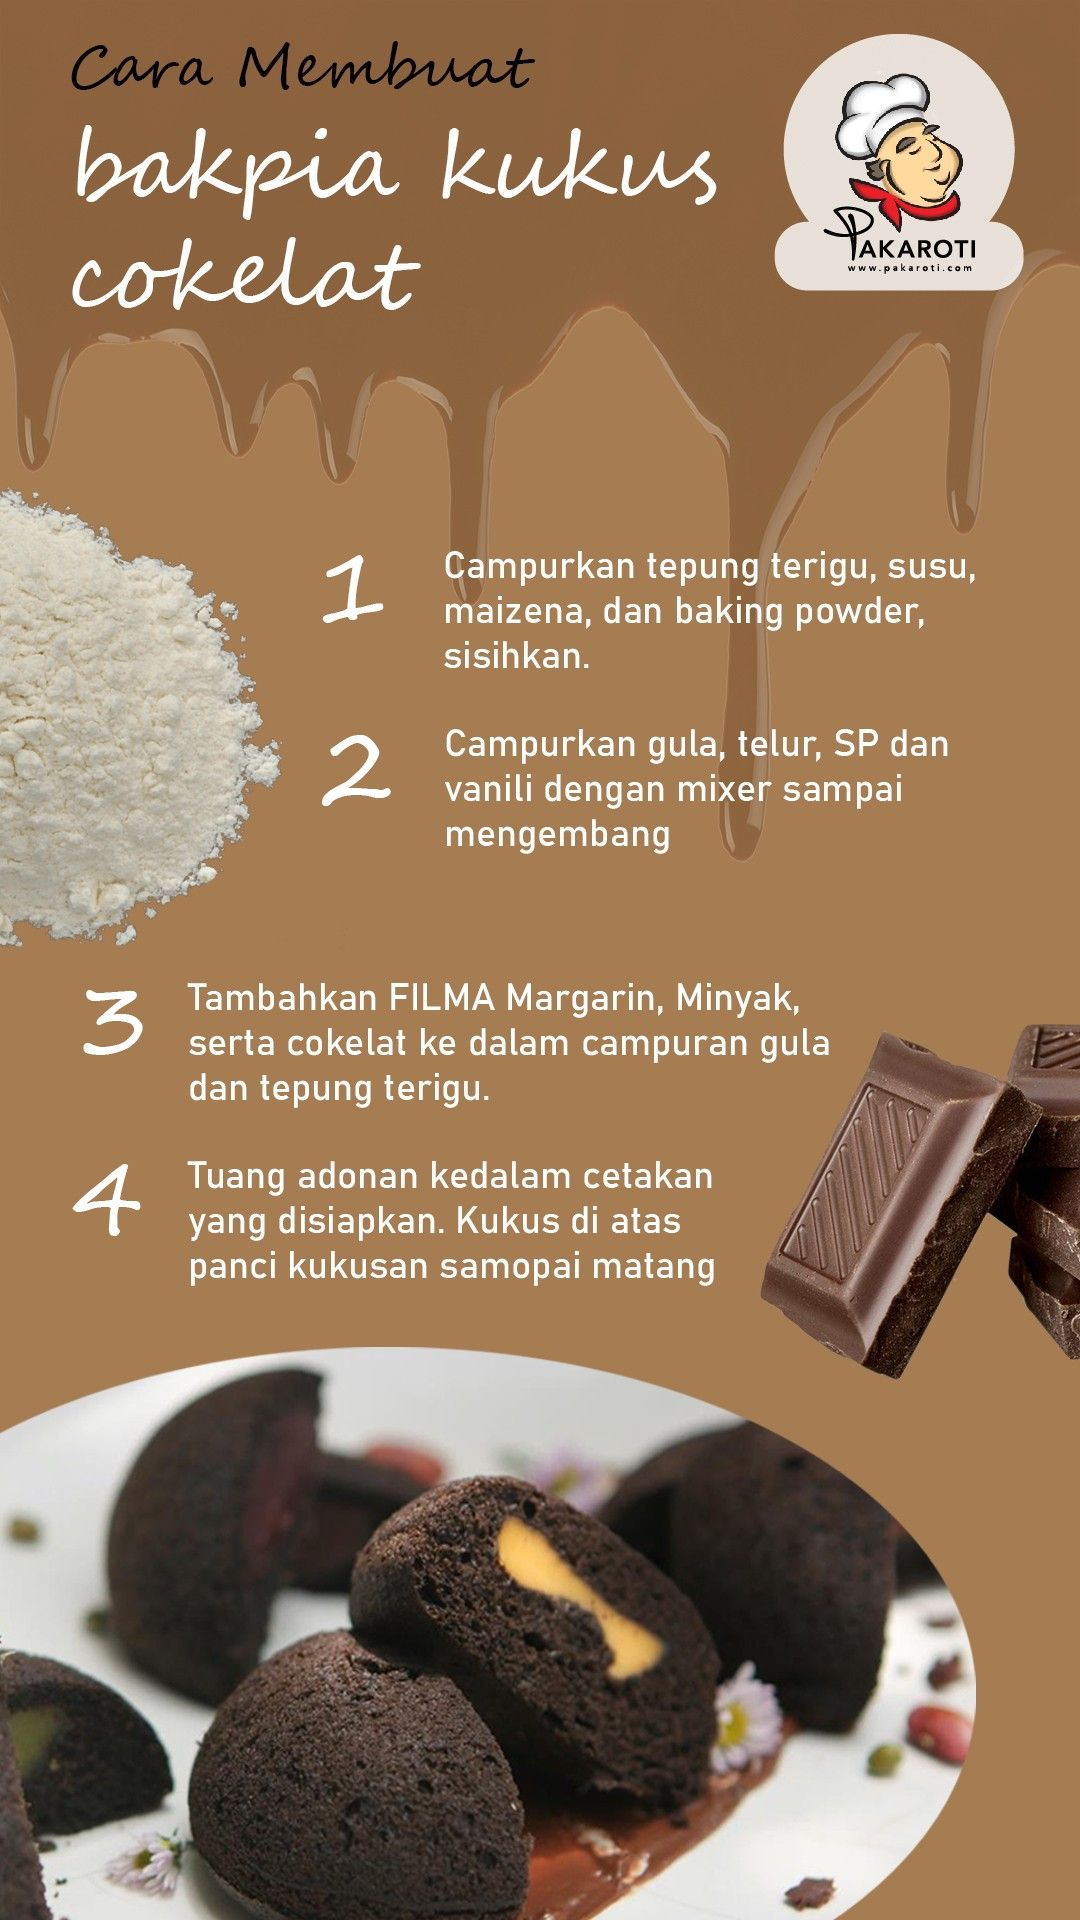 Cara Membuat Bakpia : membuat, bakpia, Membuat, Bakpia, Kukus, Cokelat, Makanan, Penutup, Mini,, Makanan,, Resep, Masakan, Natal